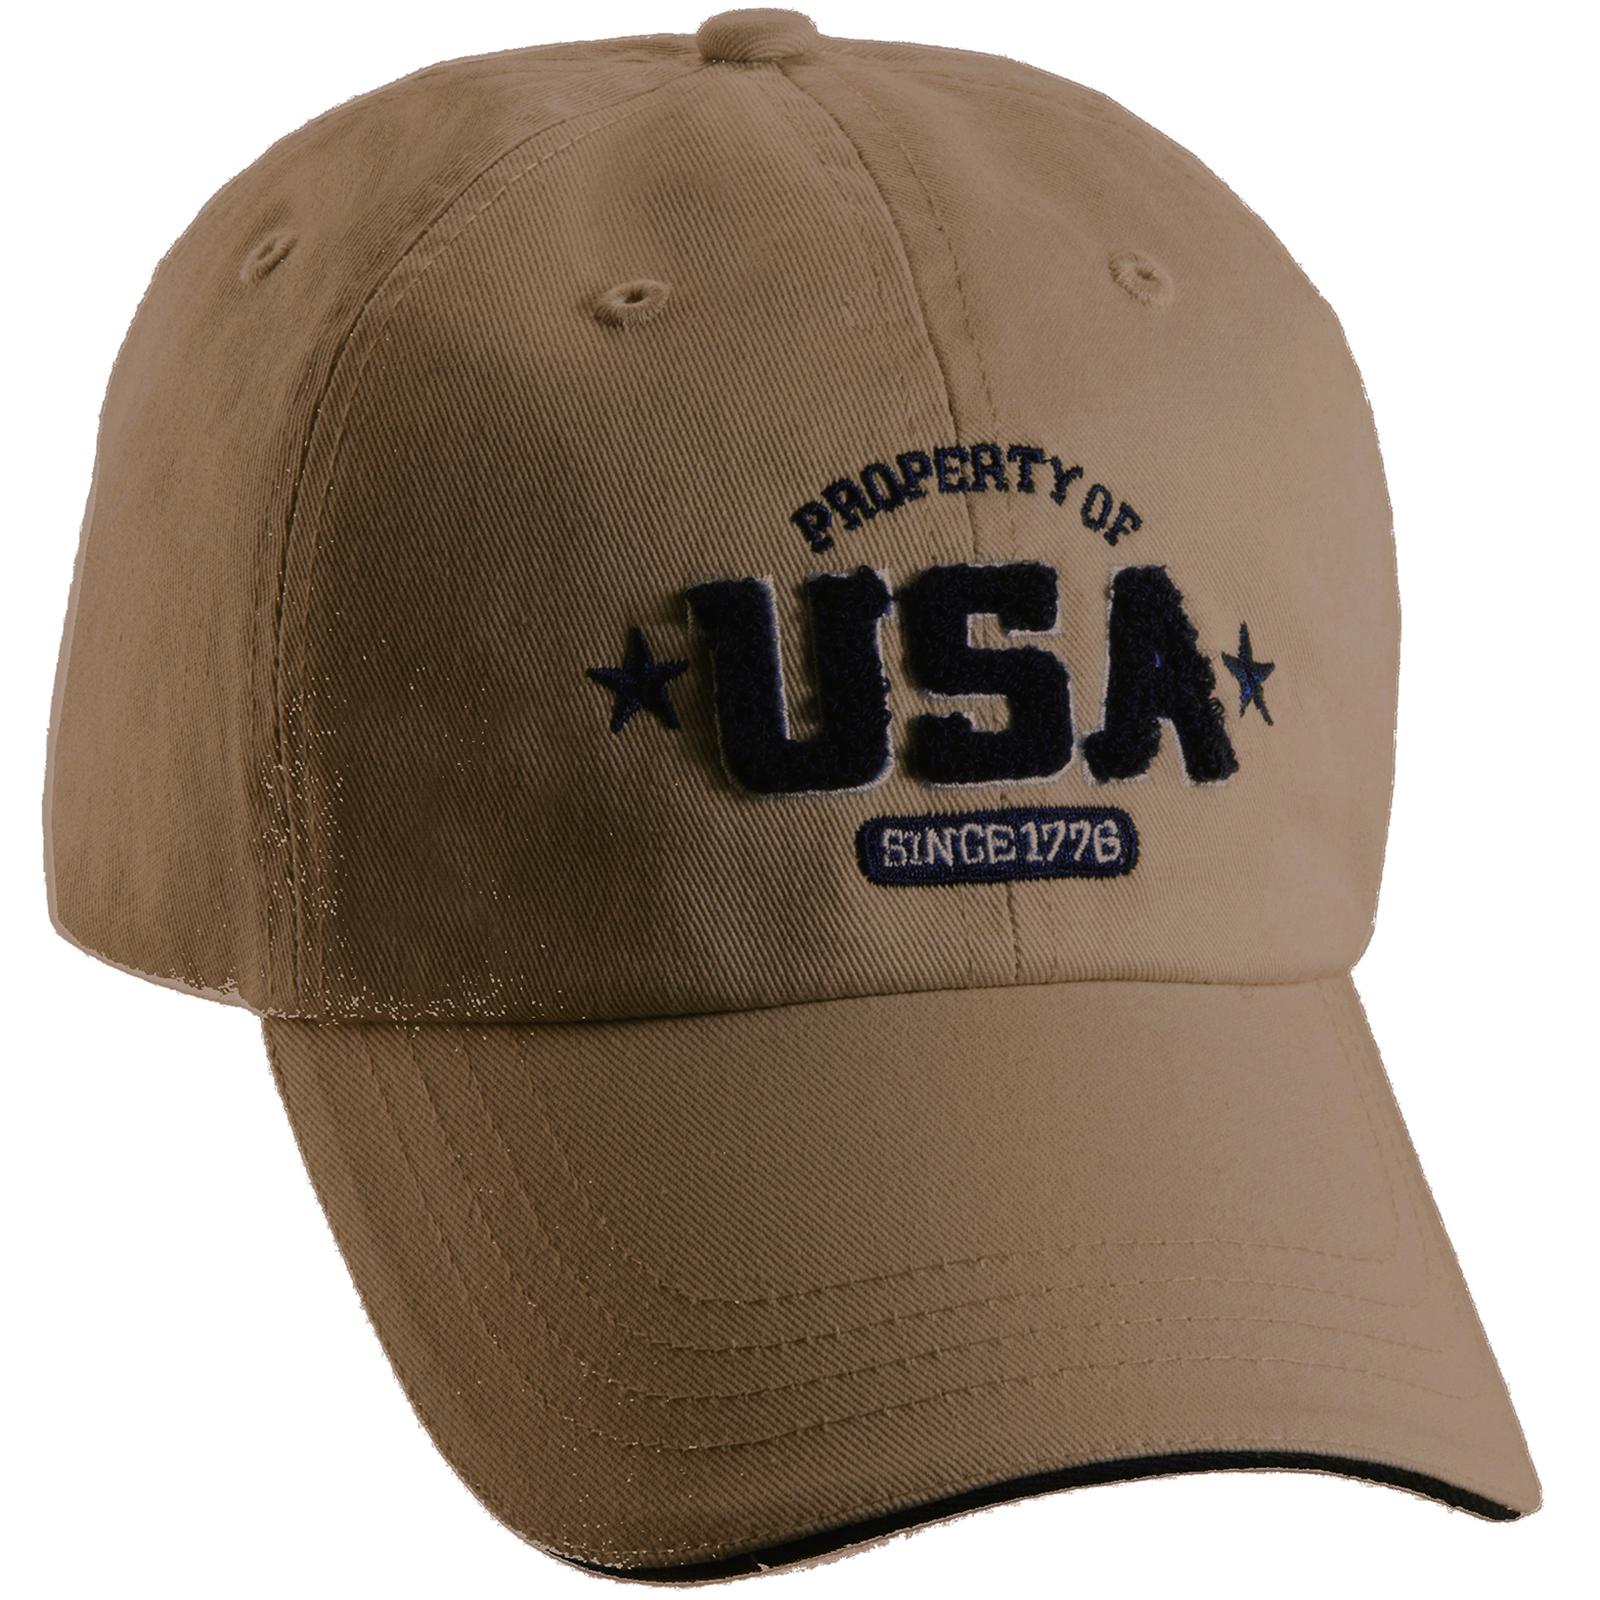 dorfman pacific property of usa since 1776 cotton cap